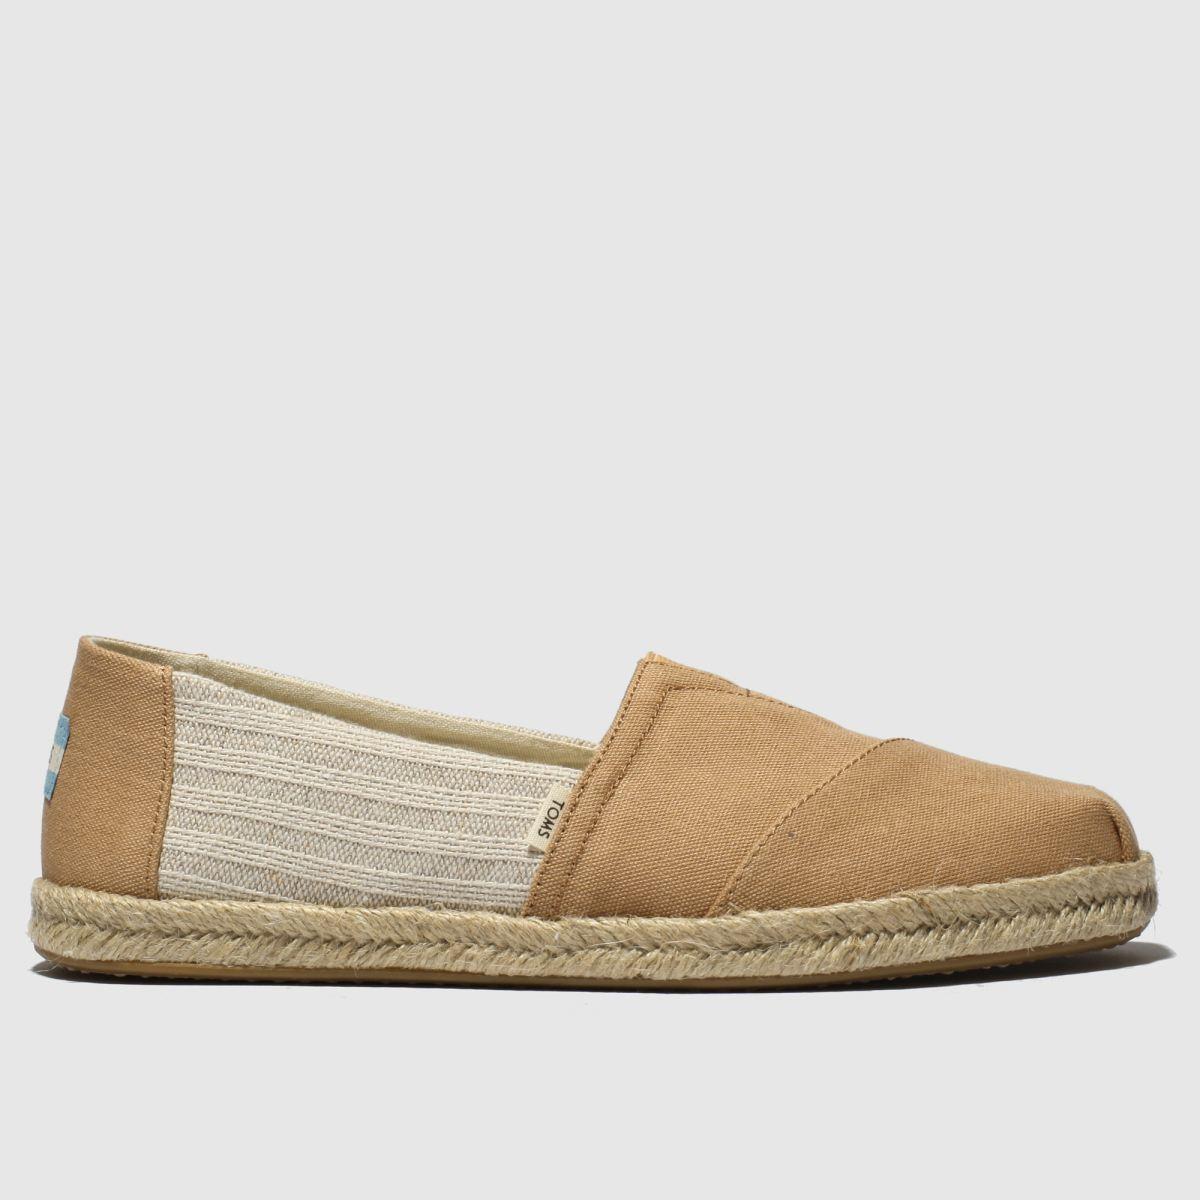 Toms Peach Alpargata Flat Shoes